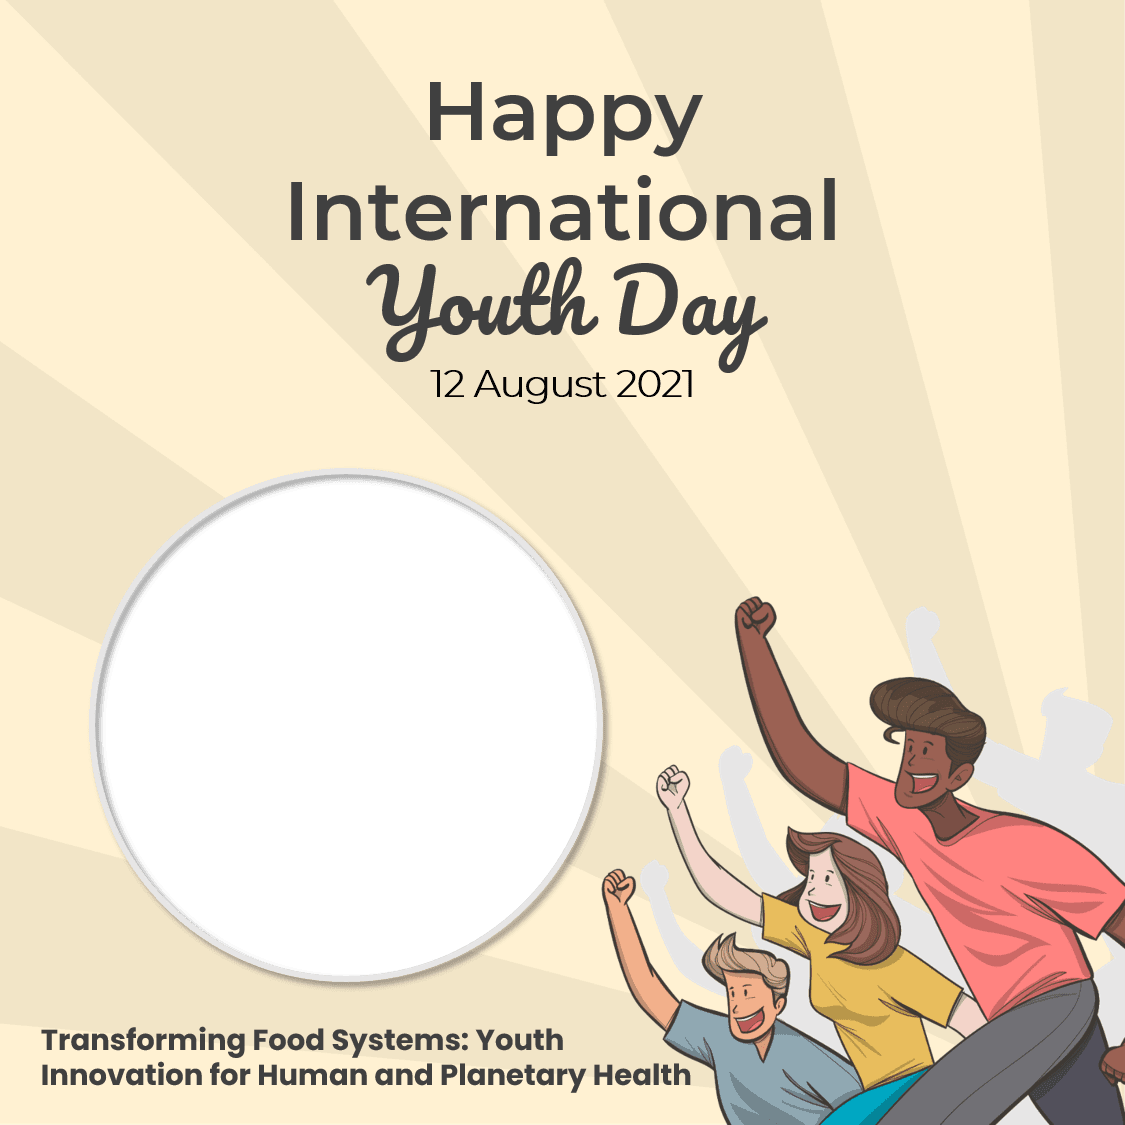 Template Backgound Frame Bingkai Twibbon Happy International Youth Day 12 August 2021 Quotes - Hari Remaja Sedunia 2021